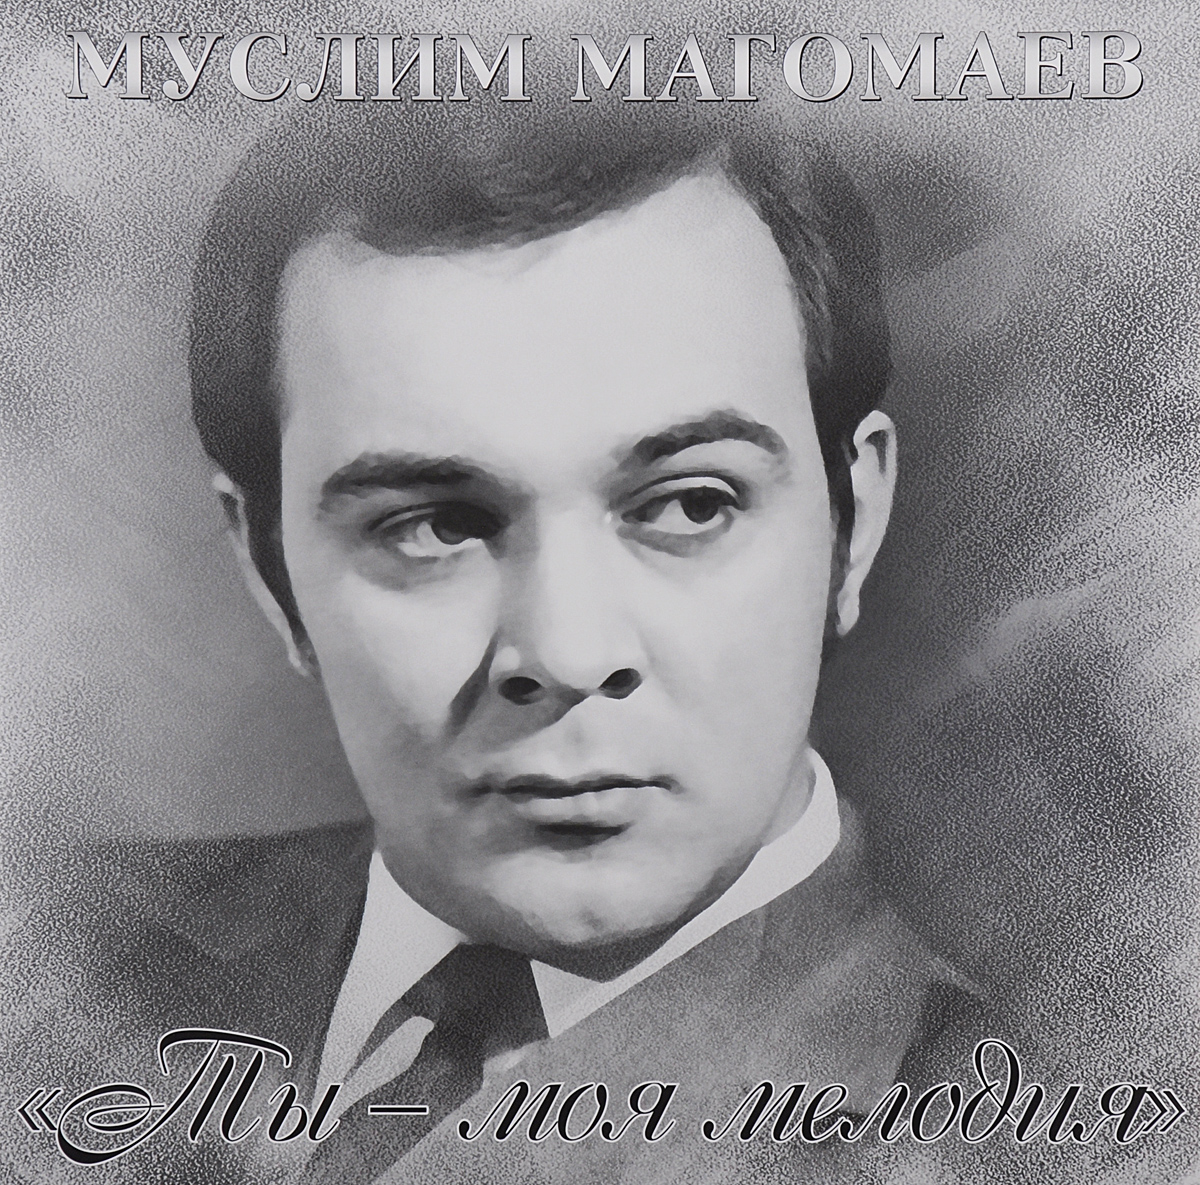 Муслим Магомаев Муслим Магомаев. Ты - моя мелодия (LP) муслим магомаев муслим магомаев ты моя мелодия lp